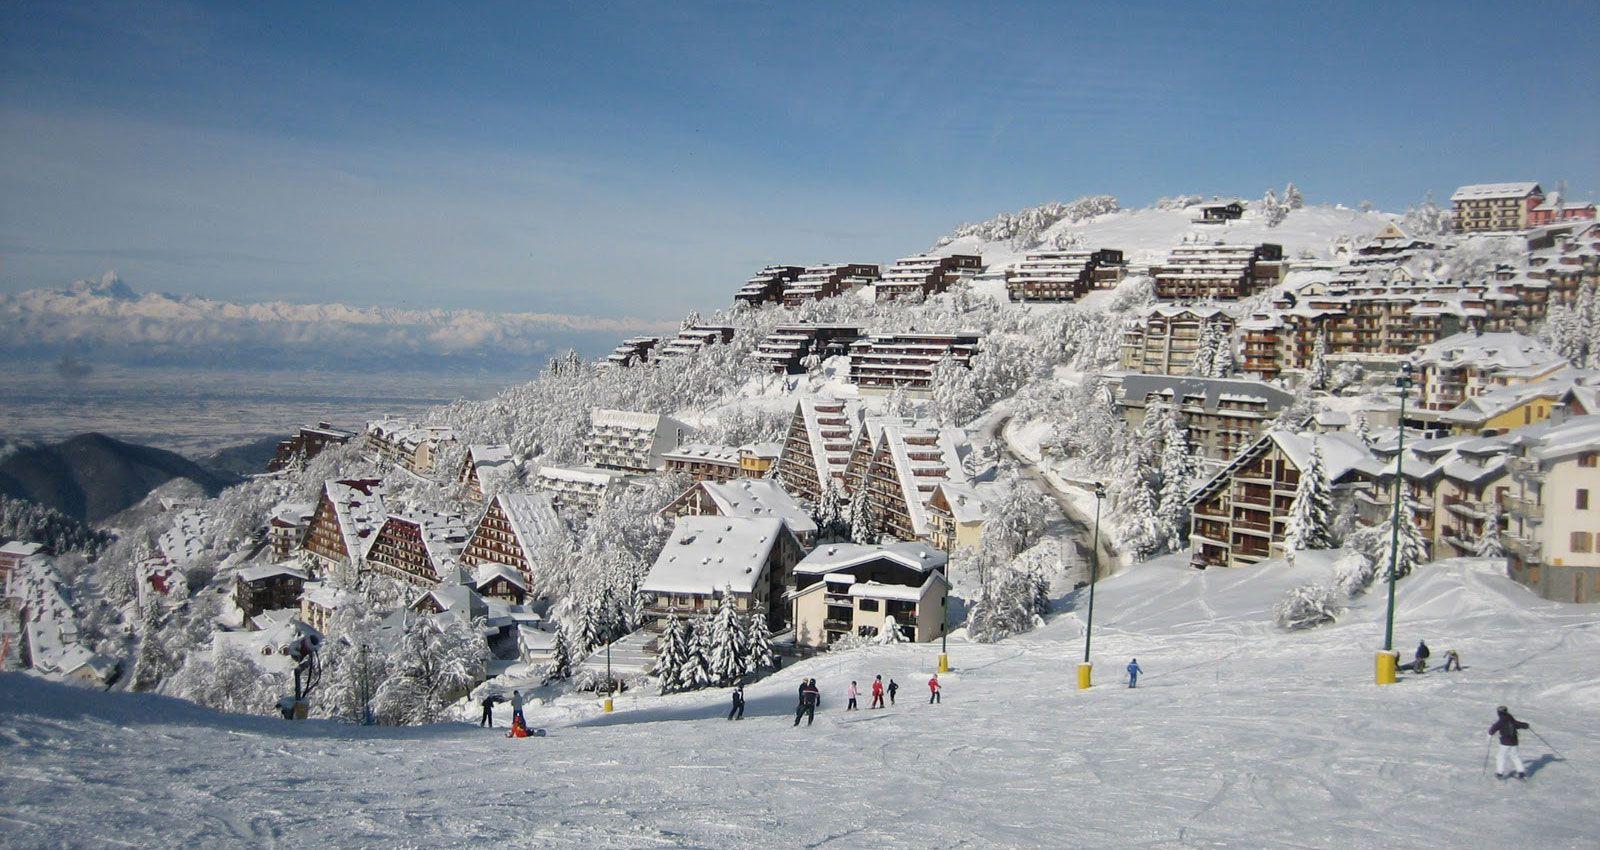 Prato Nevoso Ski Trips For Schools And Groups